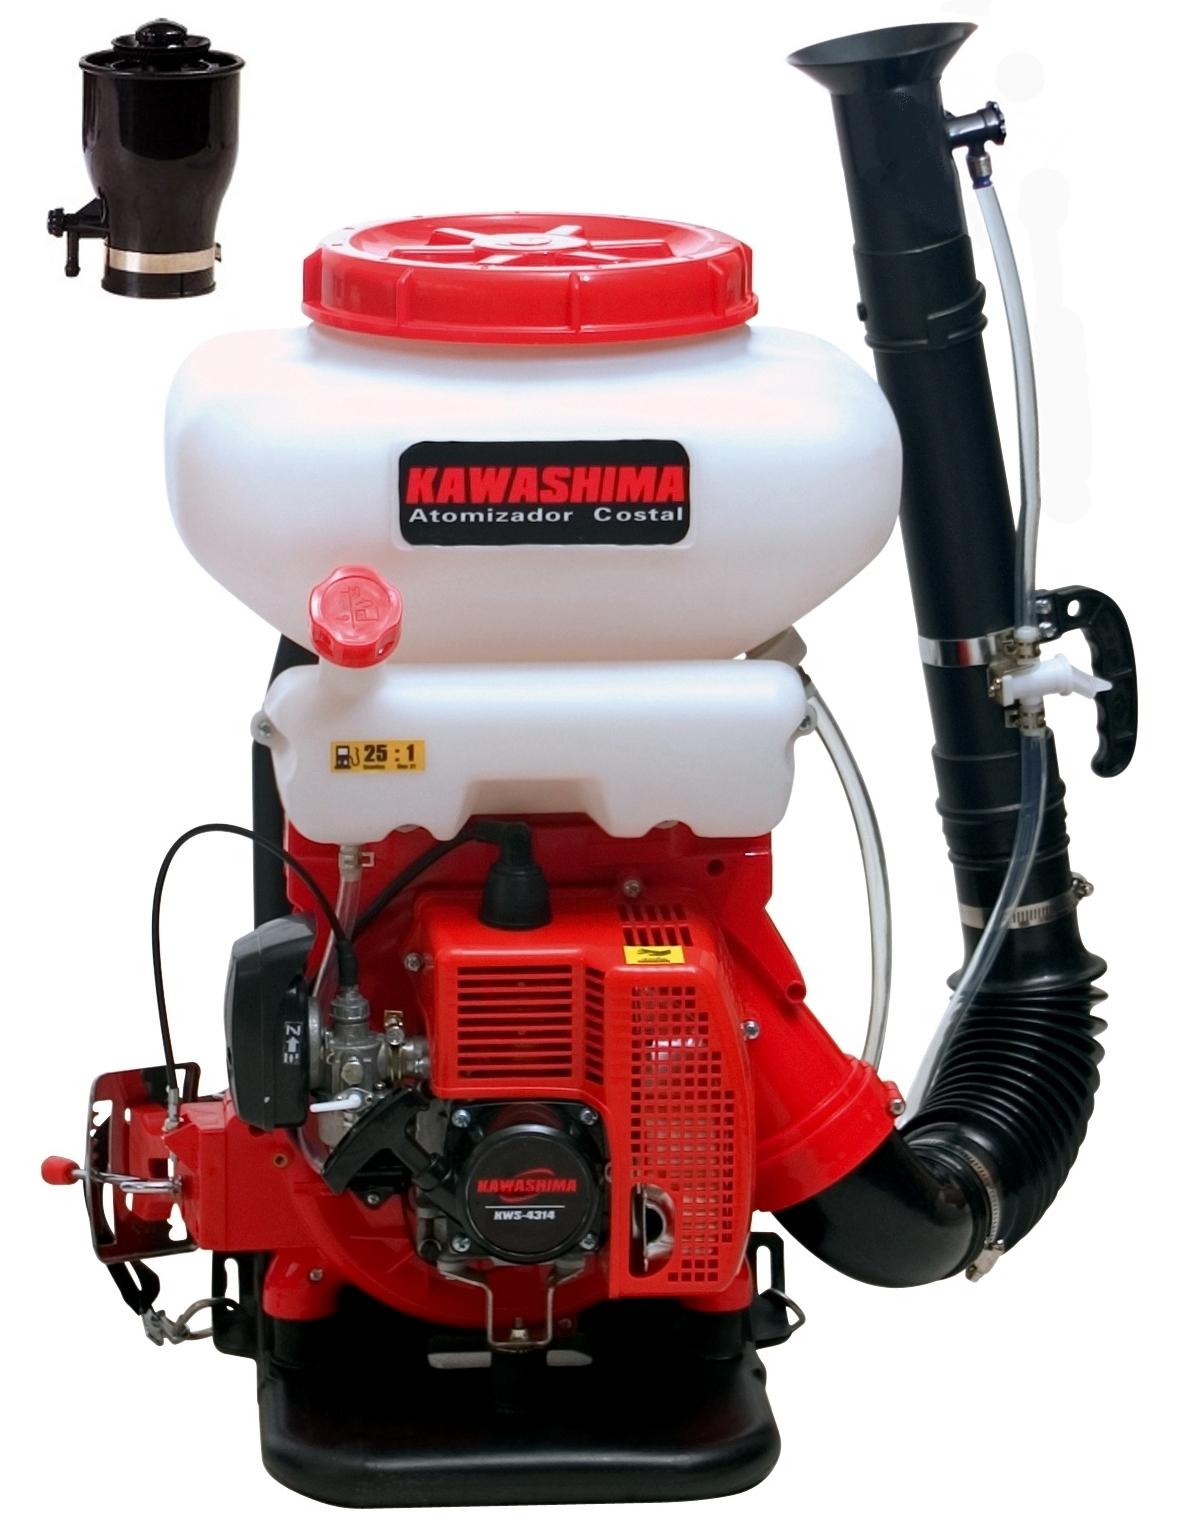 Atomizador Costal A Gasolina Kawashima Modelo At4314u - Ferramentas MEP